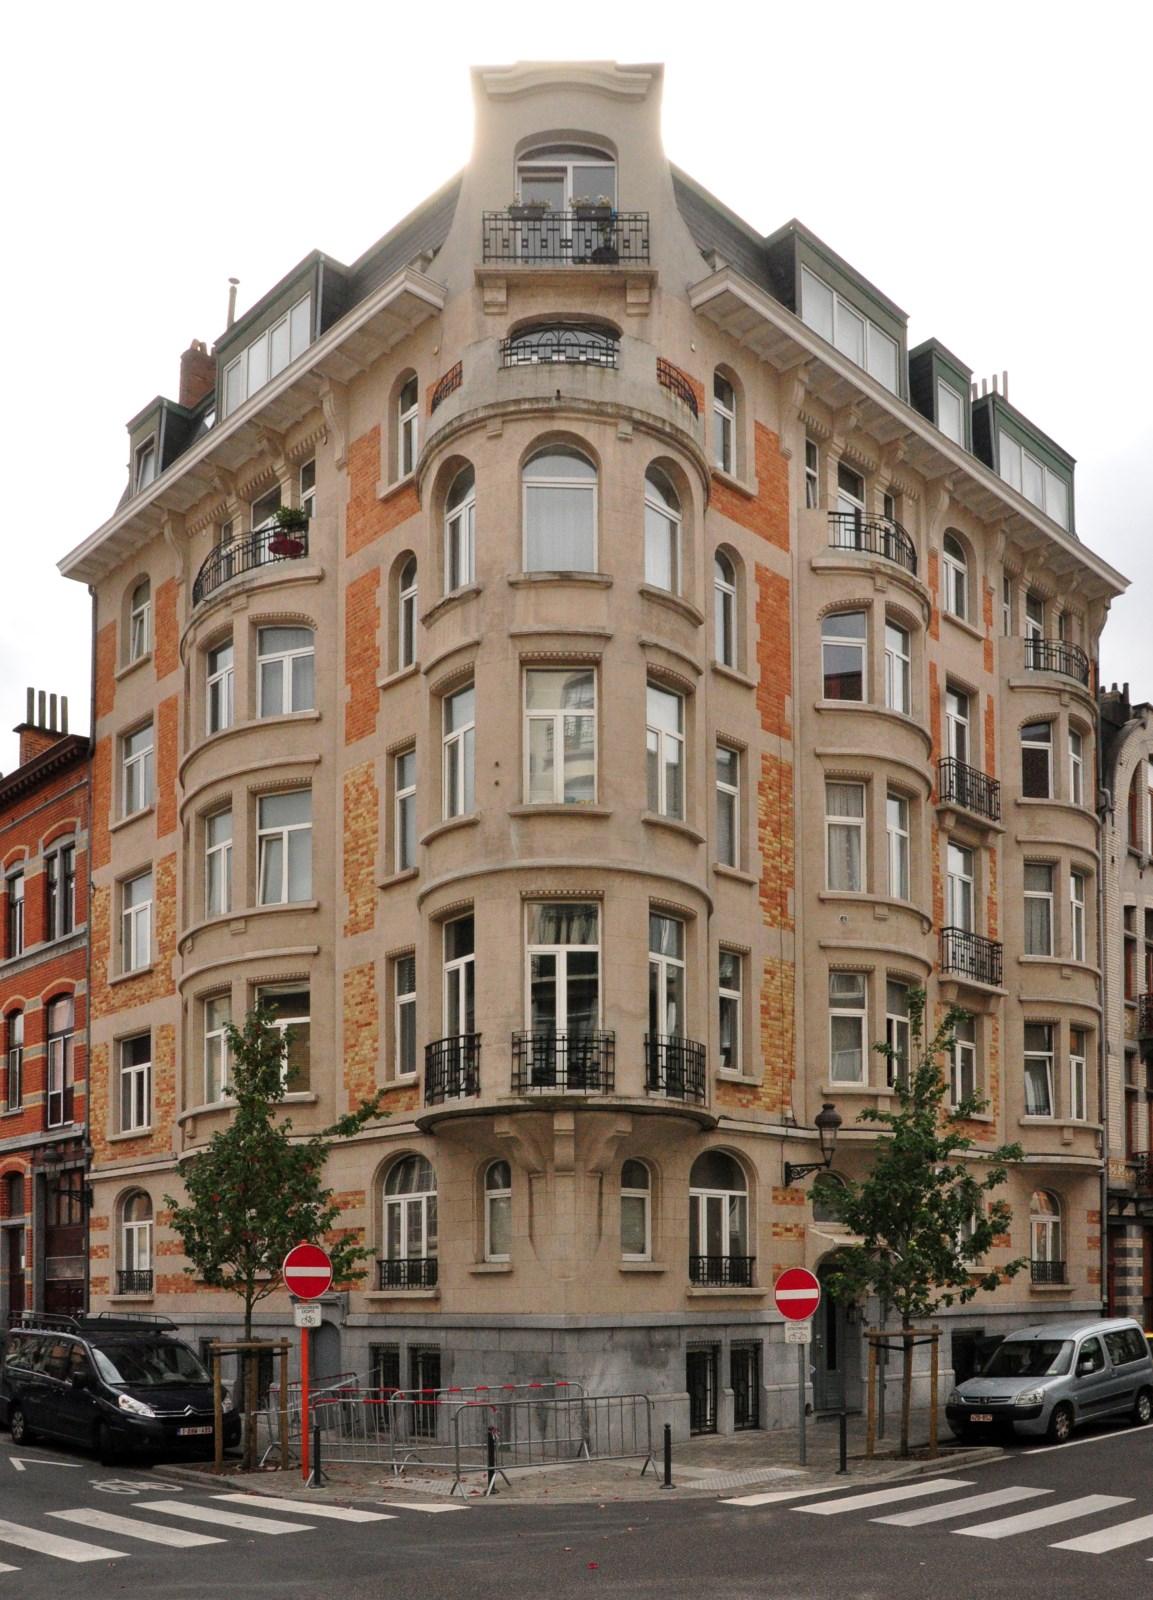 Rue Max Roos 29, 2012